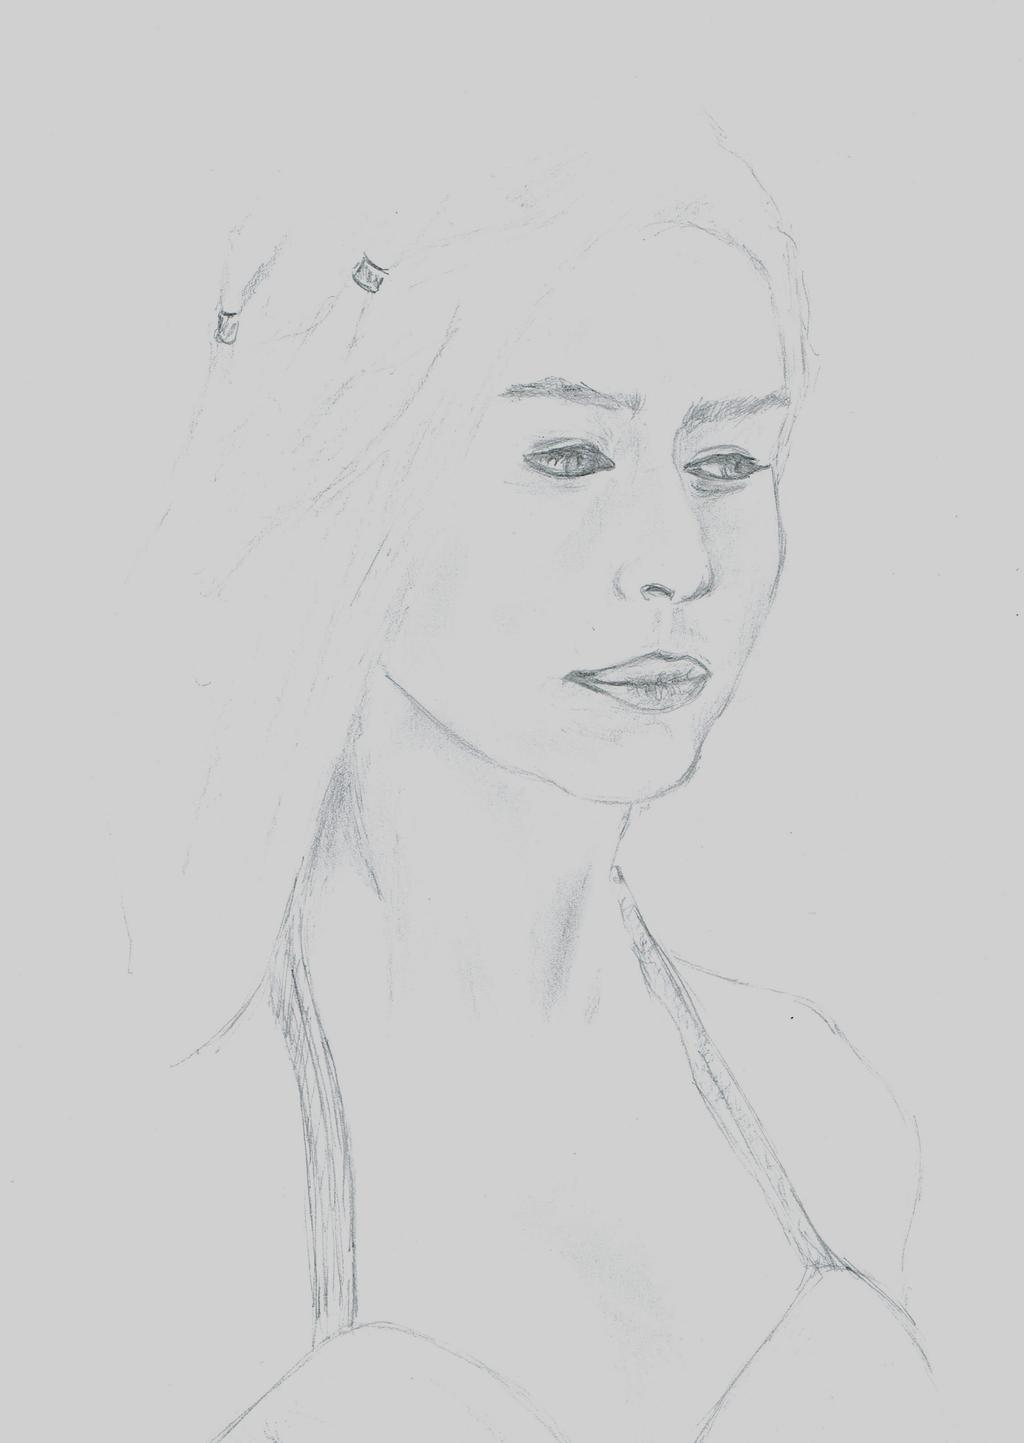 Daenerys by SuperTheo32